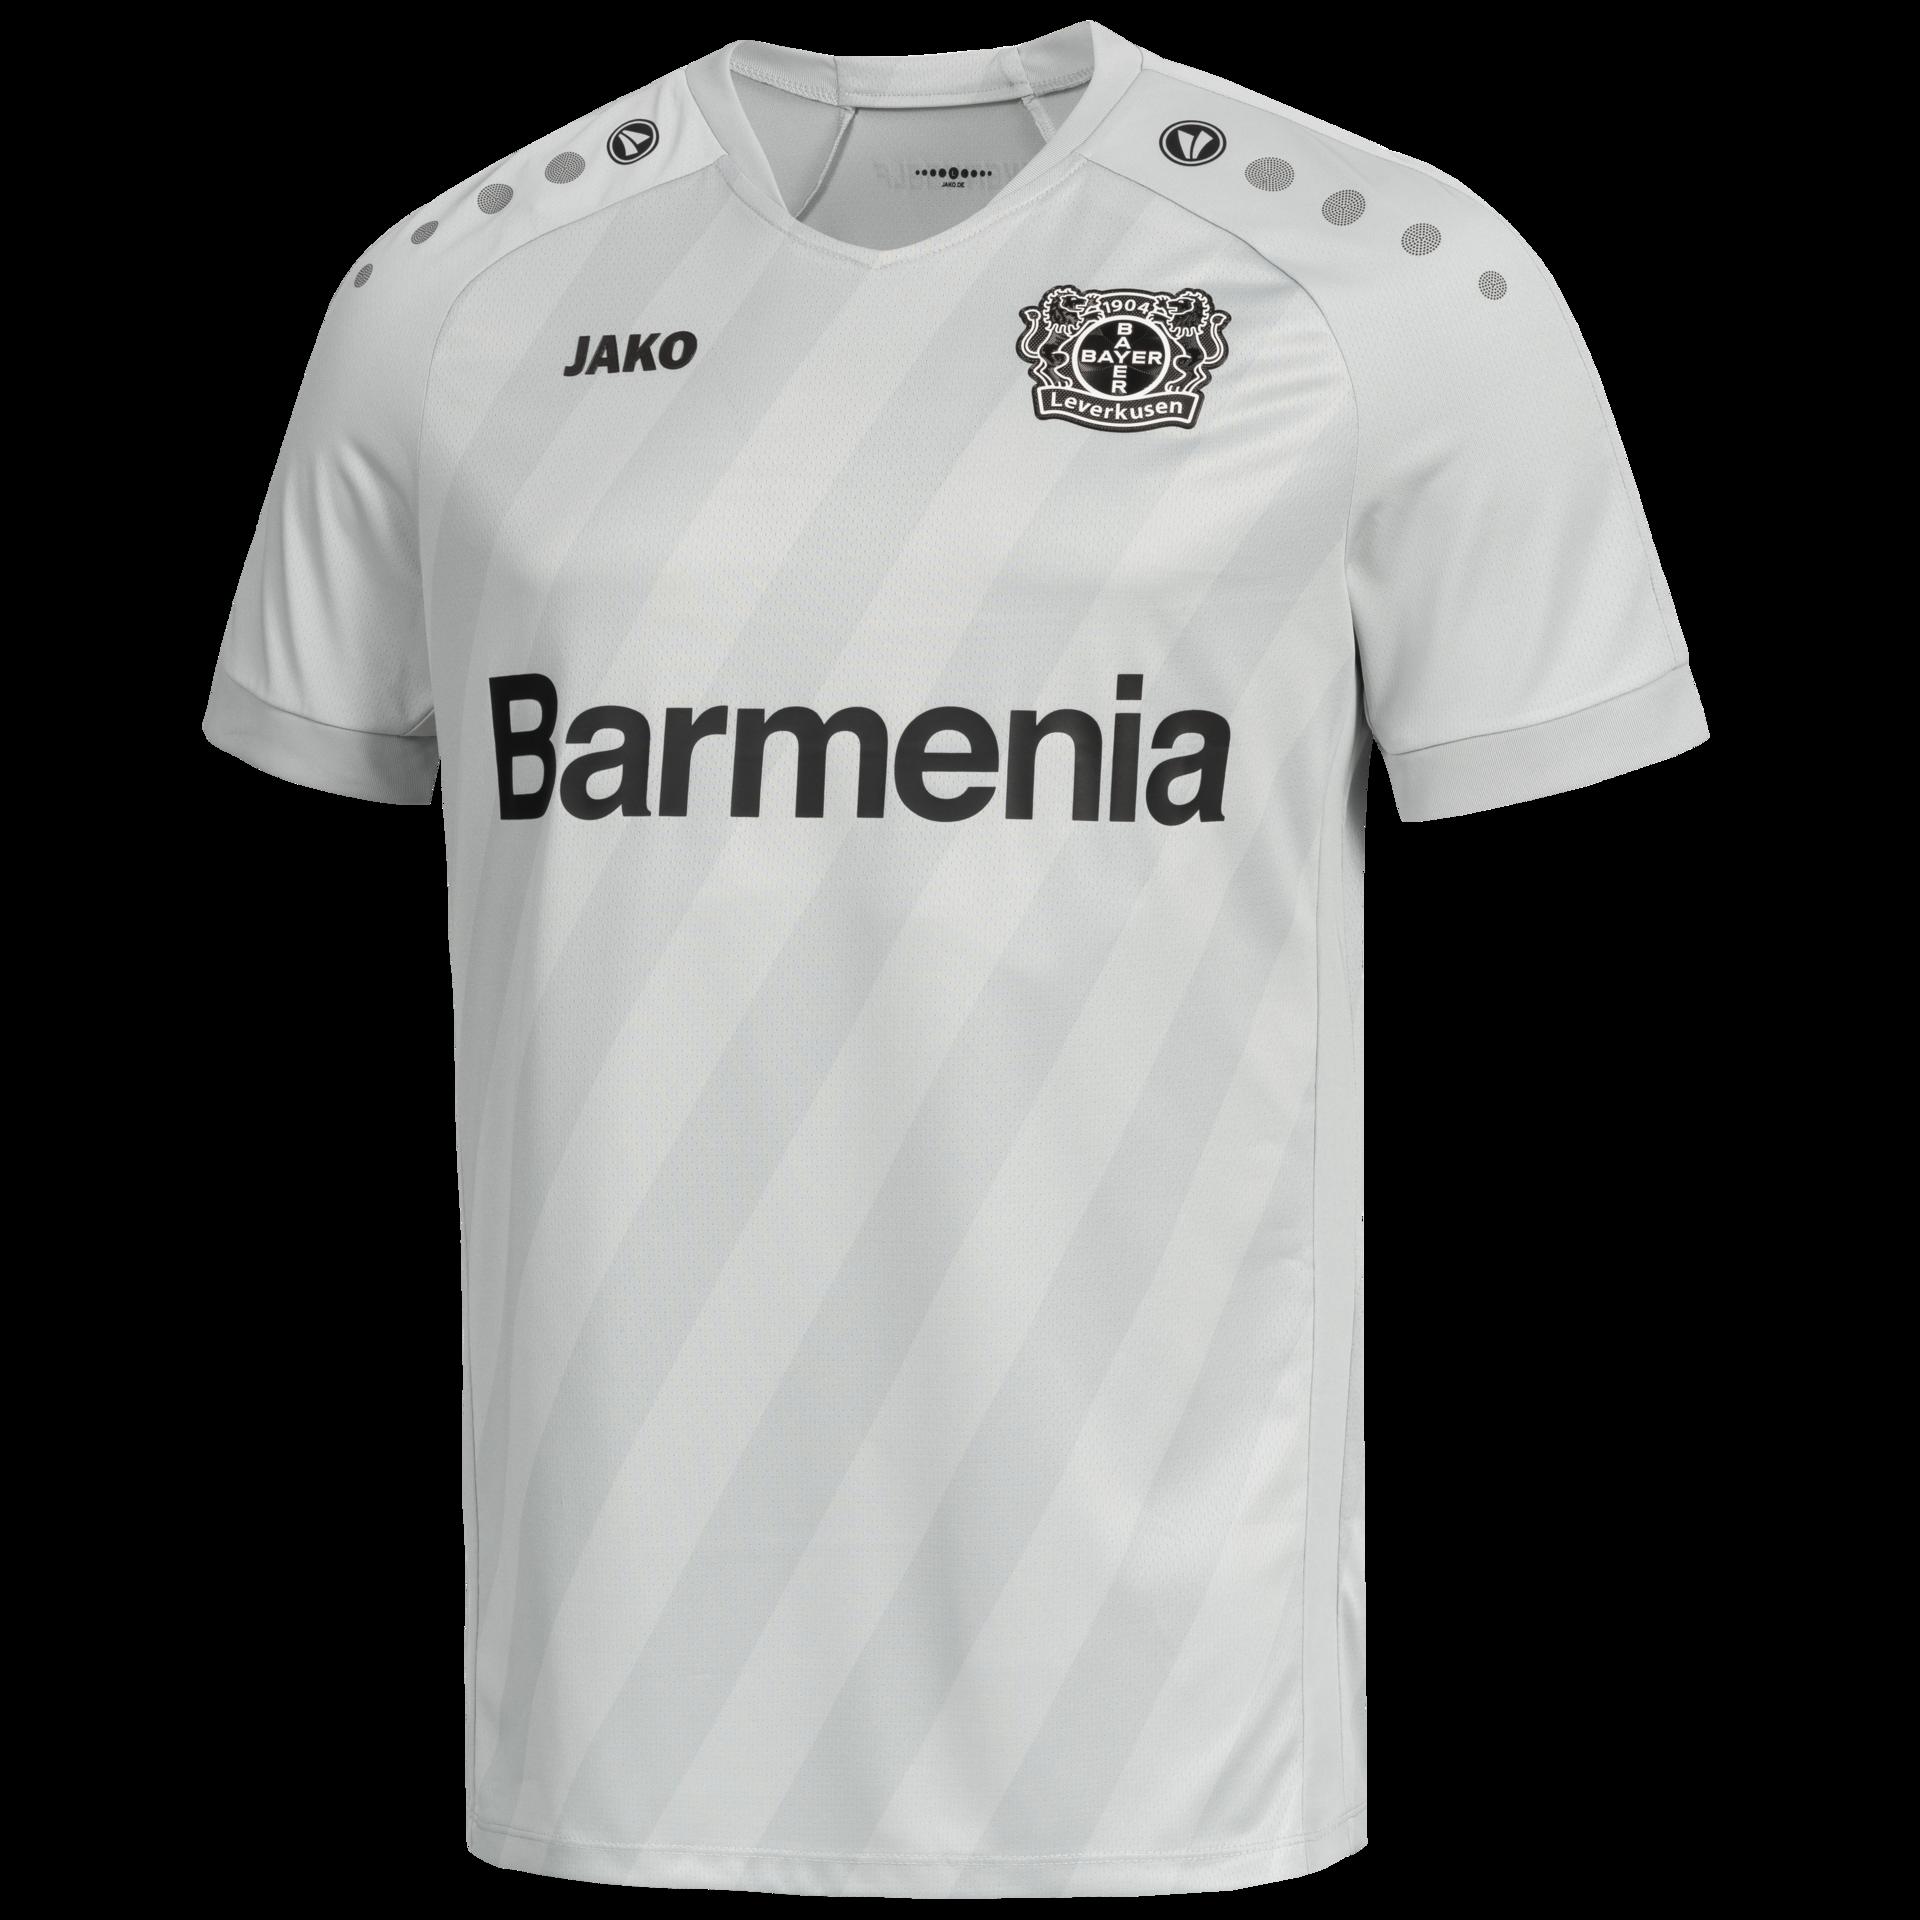 JAKO Bayer Leverkusen premium Hoodie enfants b04 Sweatshirt Capuche Junior 128 164